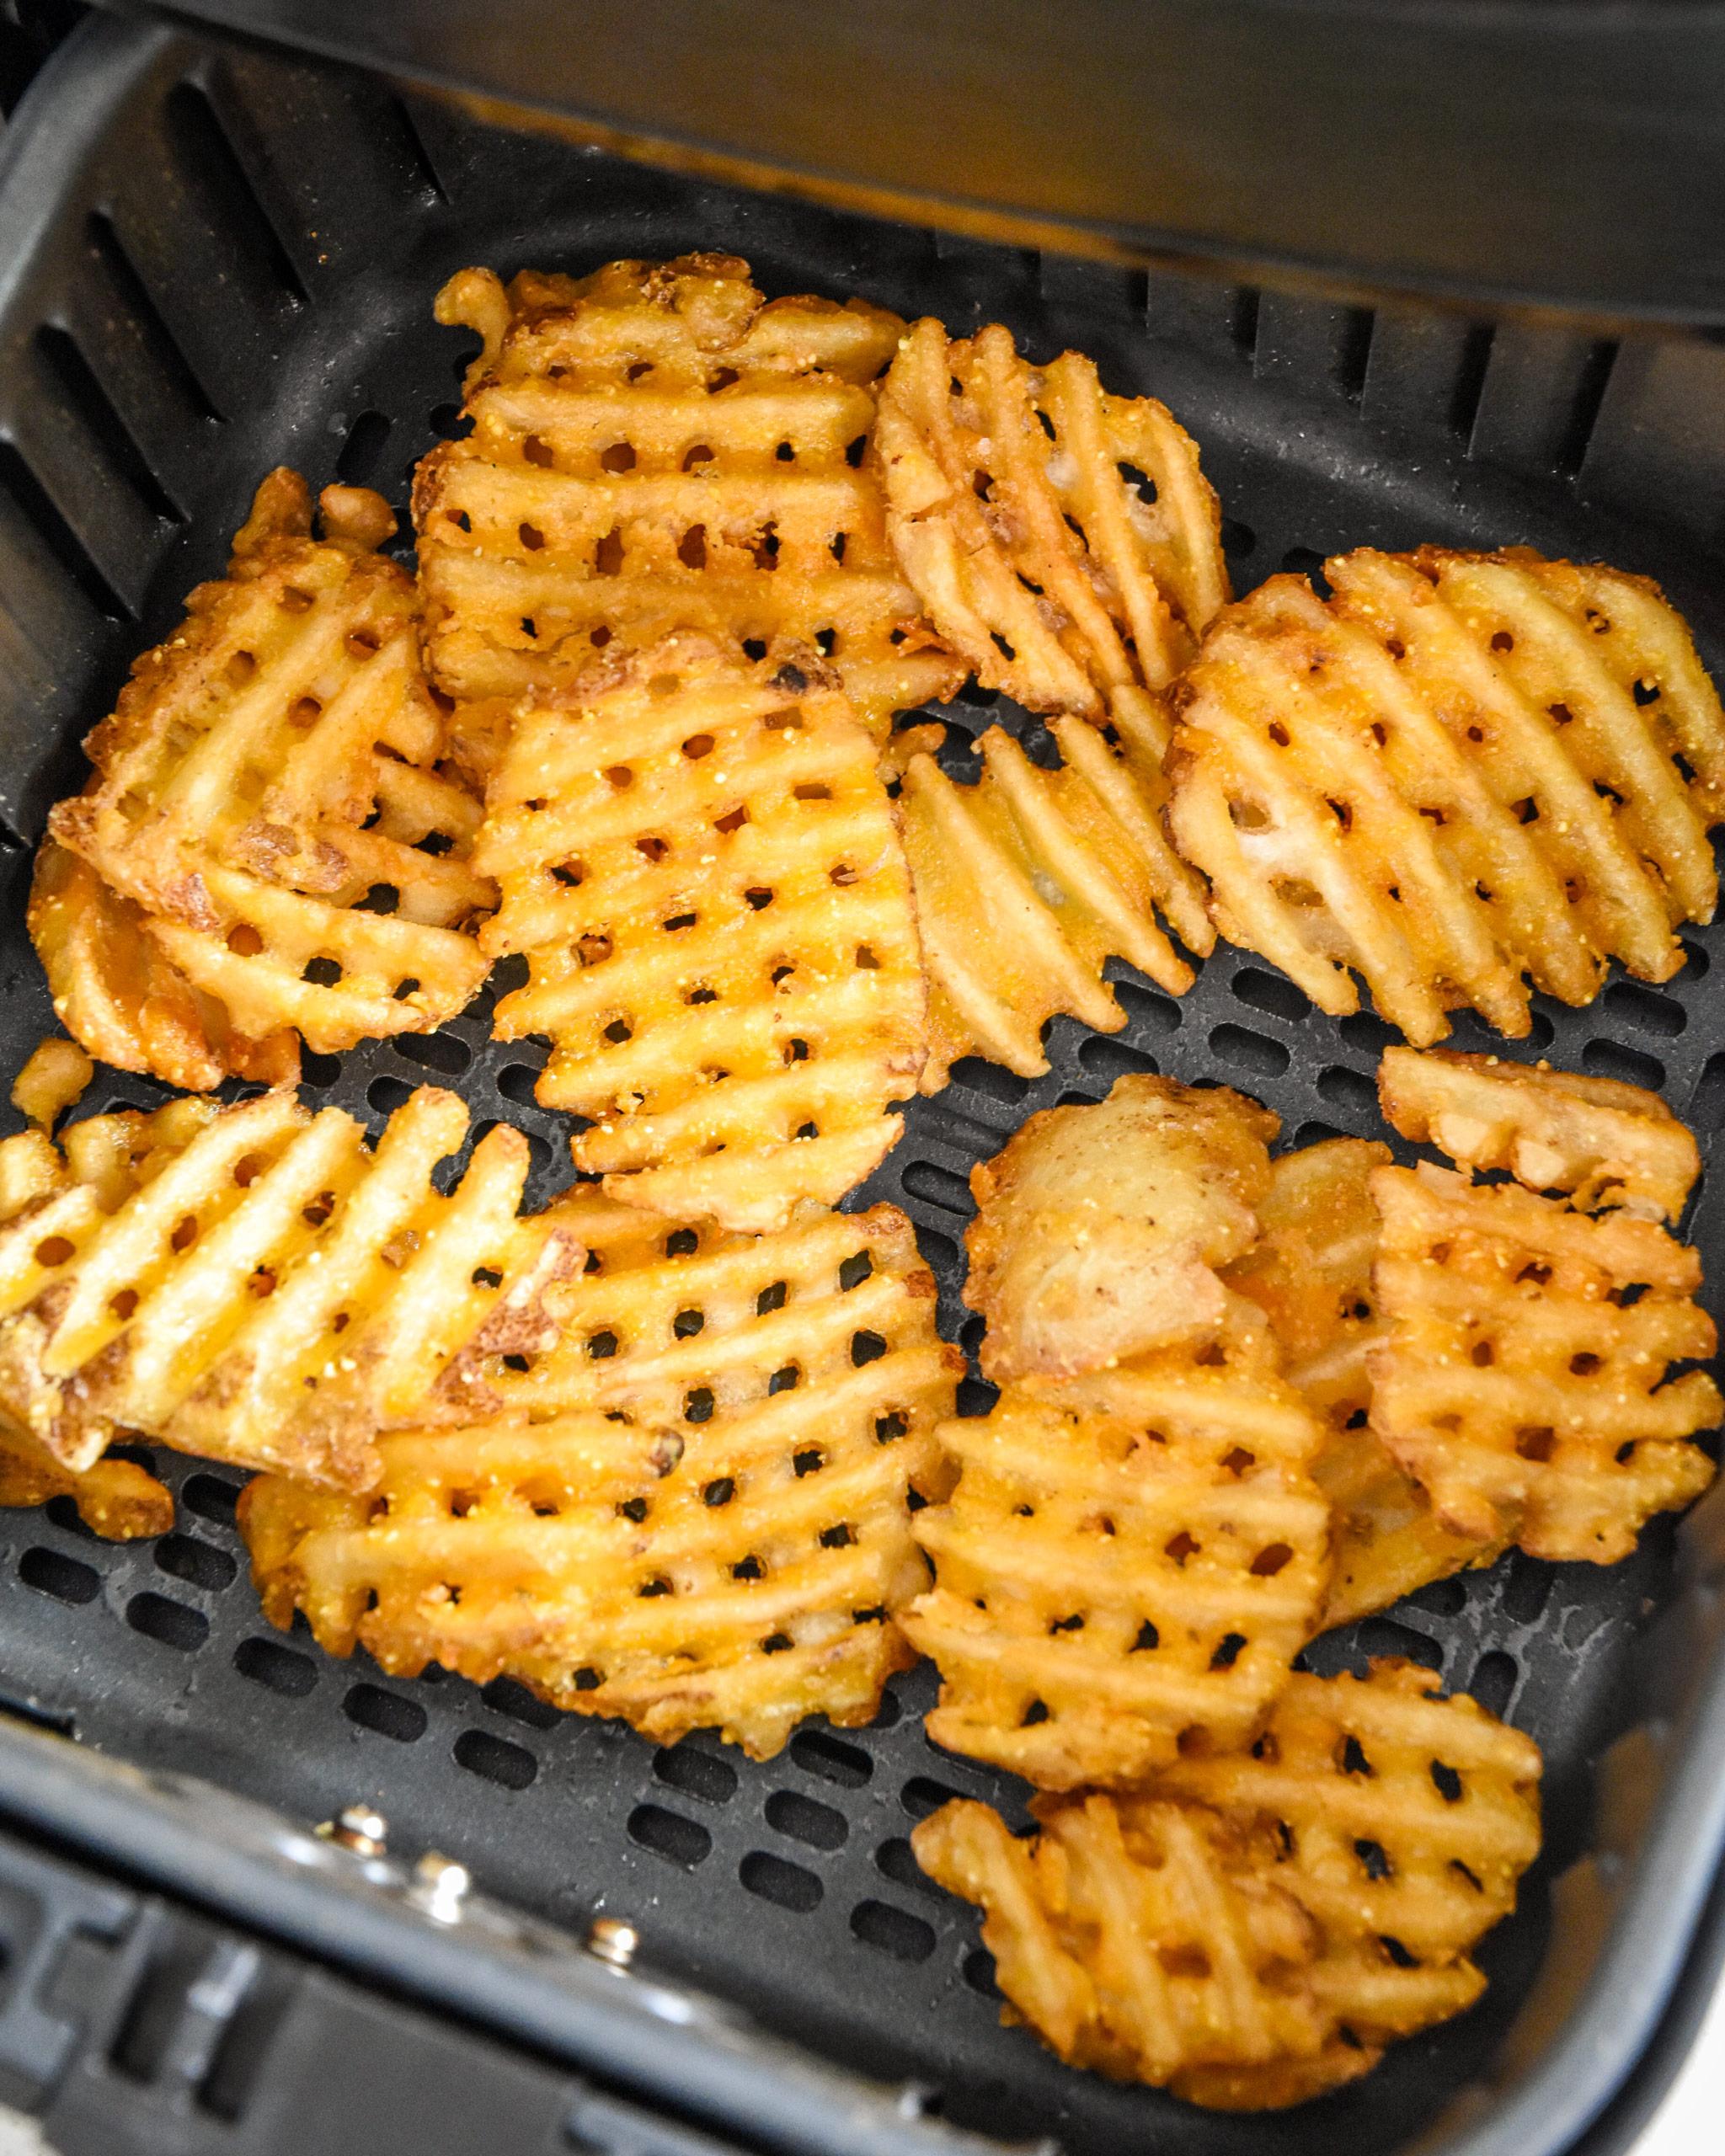 waffle fries in an air fryer basket